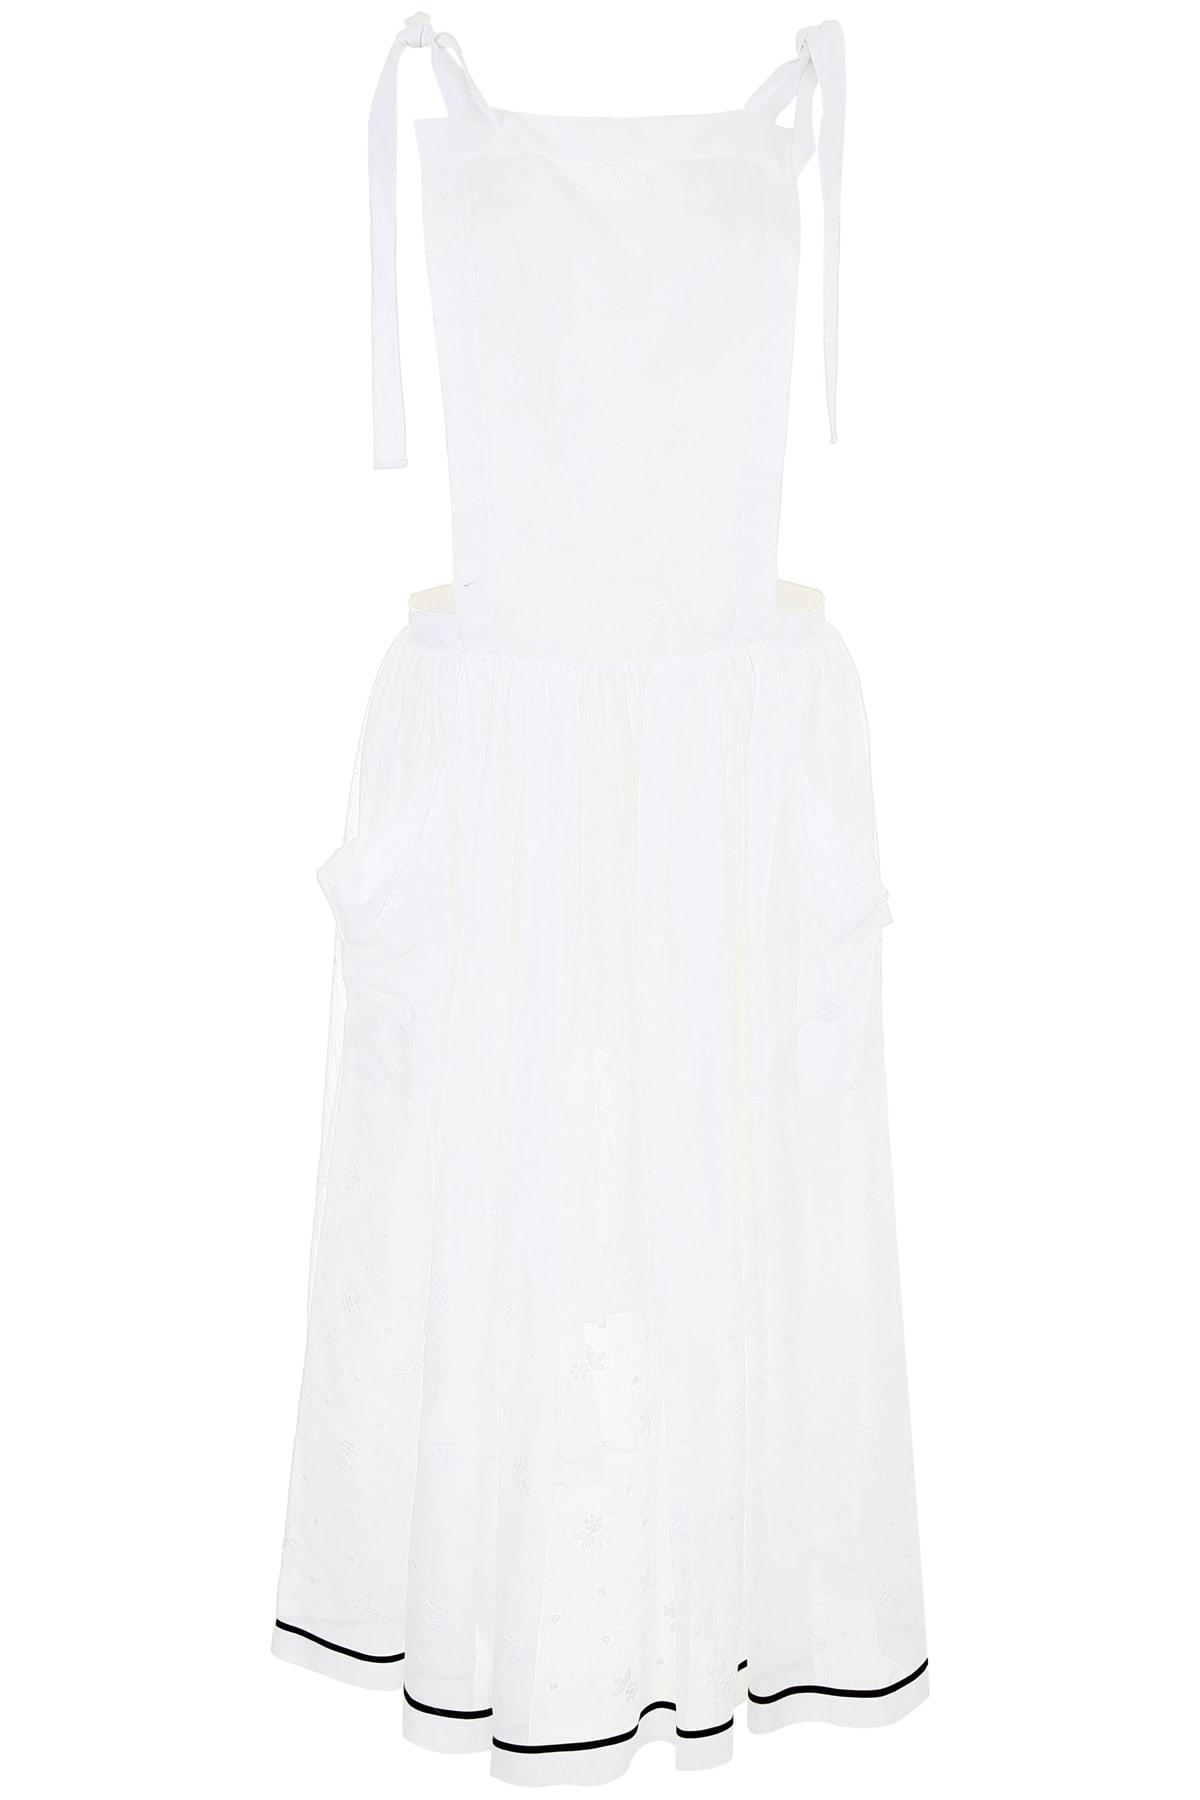 Philosophy di Lorenzo Serafini Long Embroidered Dress